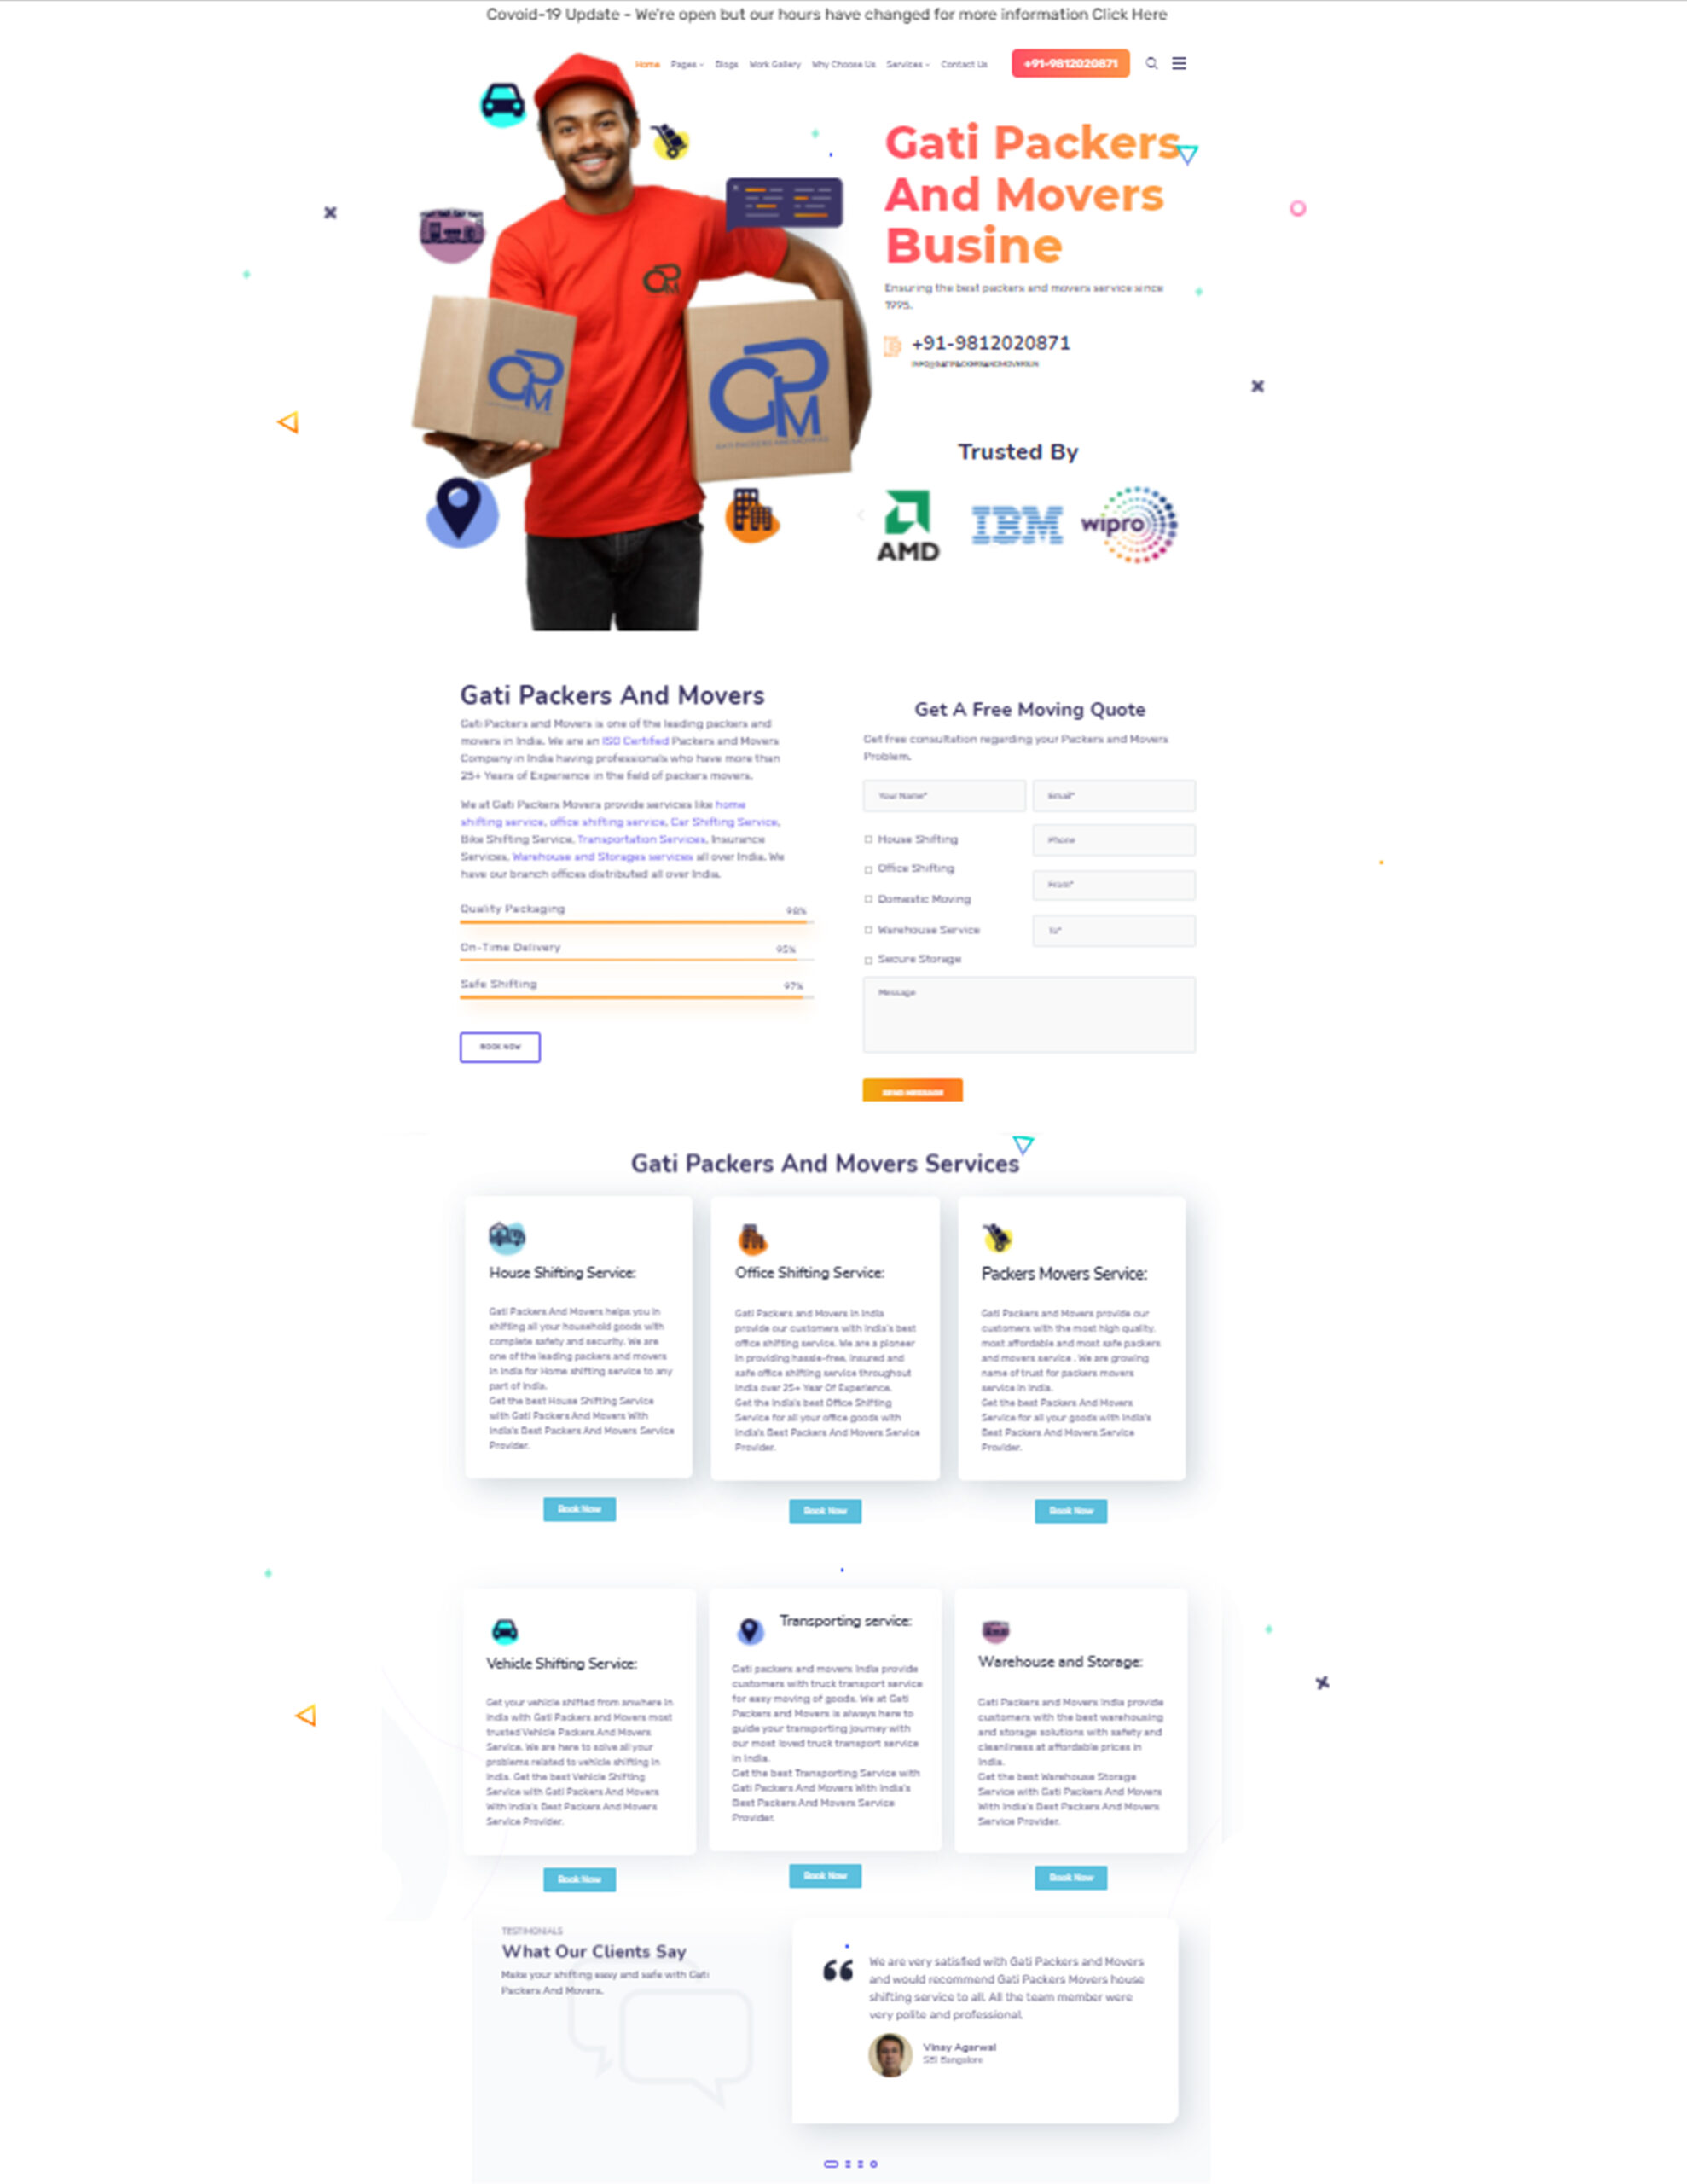 Gati Packers And Movers Website Development By Rankofy - best website development service in chandigarh